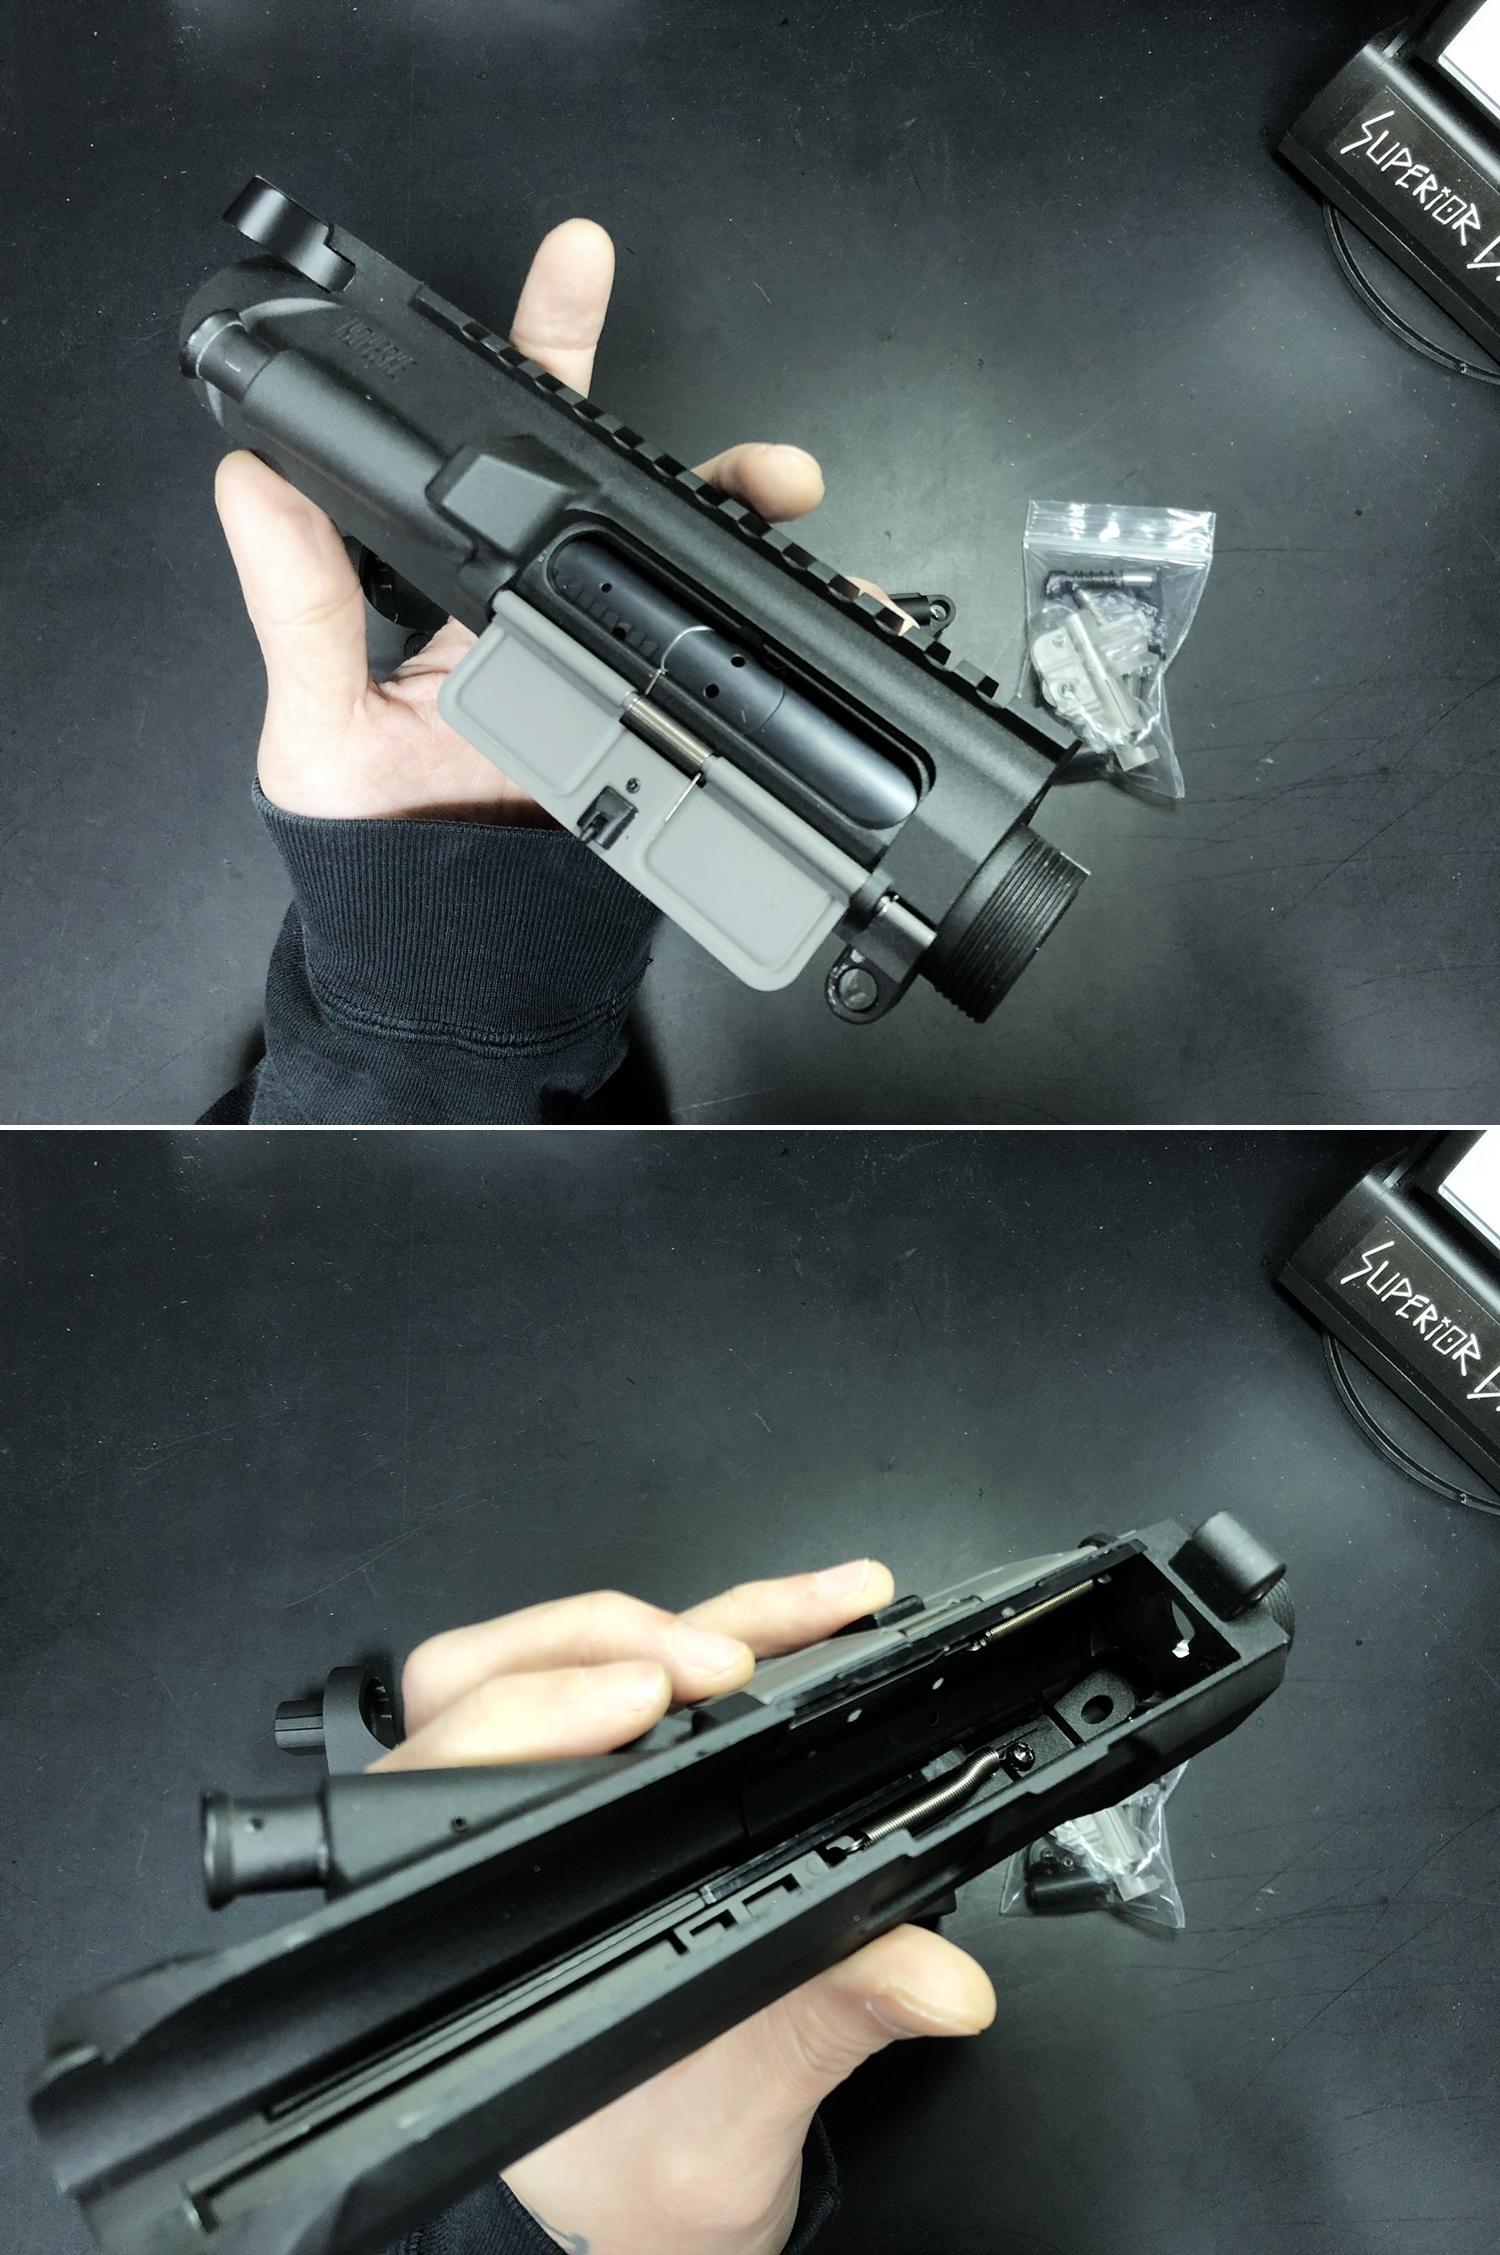 3 NOVESKE GEN3 N4 BY MADBULL!! 『第一弾』 新たにSTD民間系ARを作り始めたいと思います!! STD AR-15 M4 スタンダード 電動ガン マルイ ノベスケ ノベスキー マットブル メタルフレーム 動作テスト 組込 取付 カス